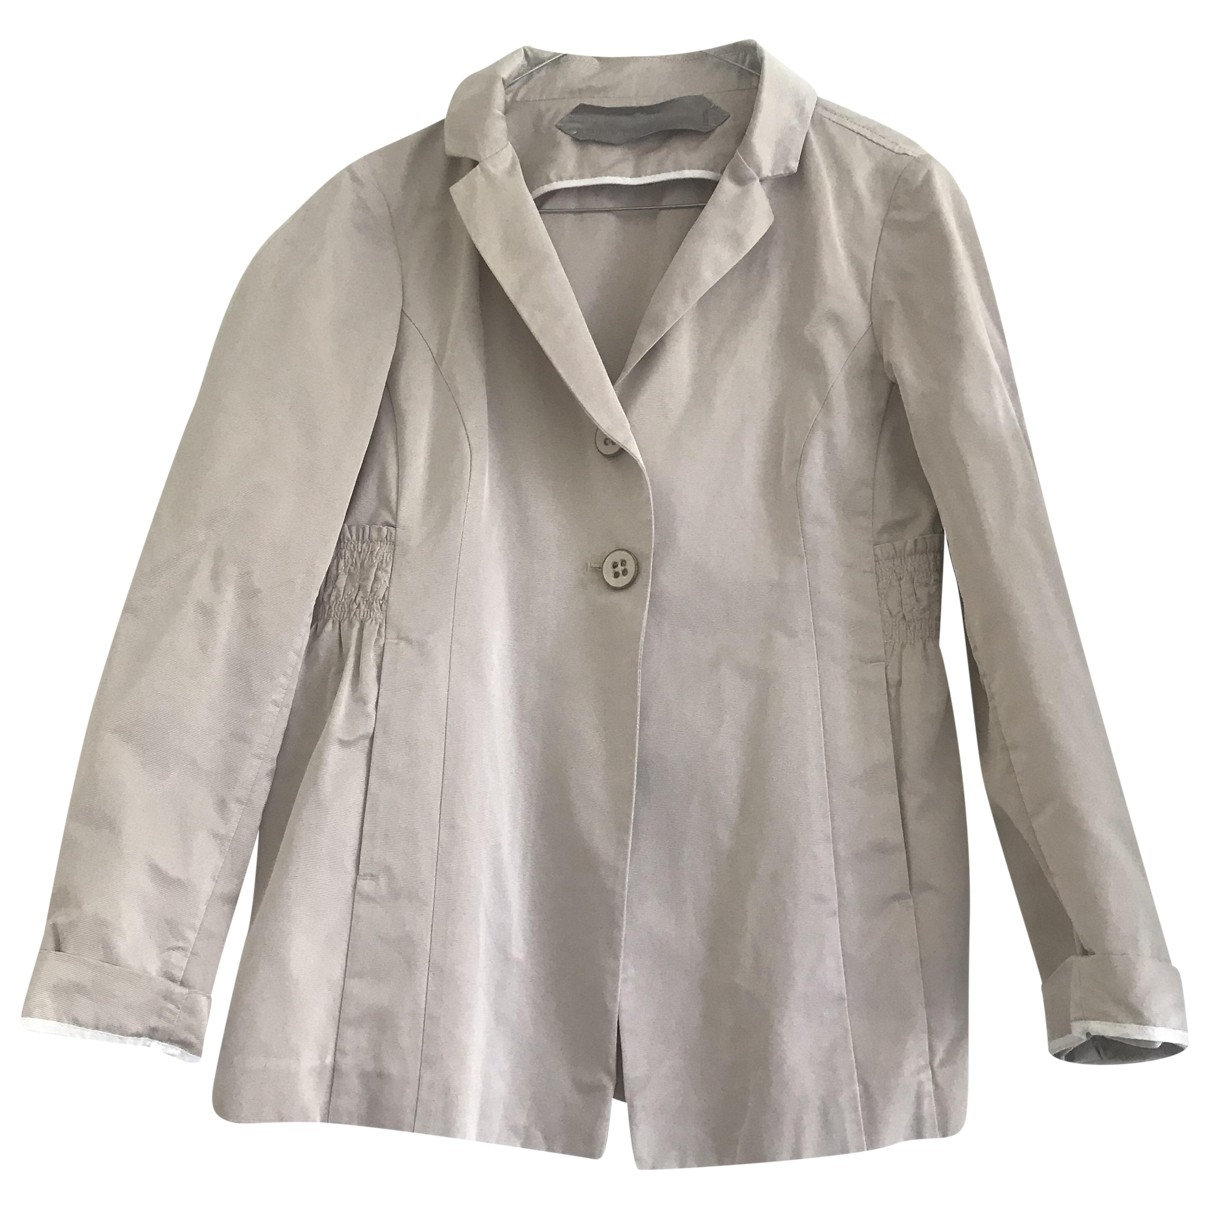 Schumacher \N Pink jacket for Women S International